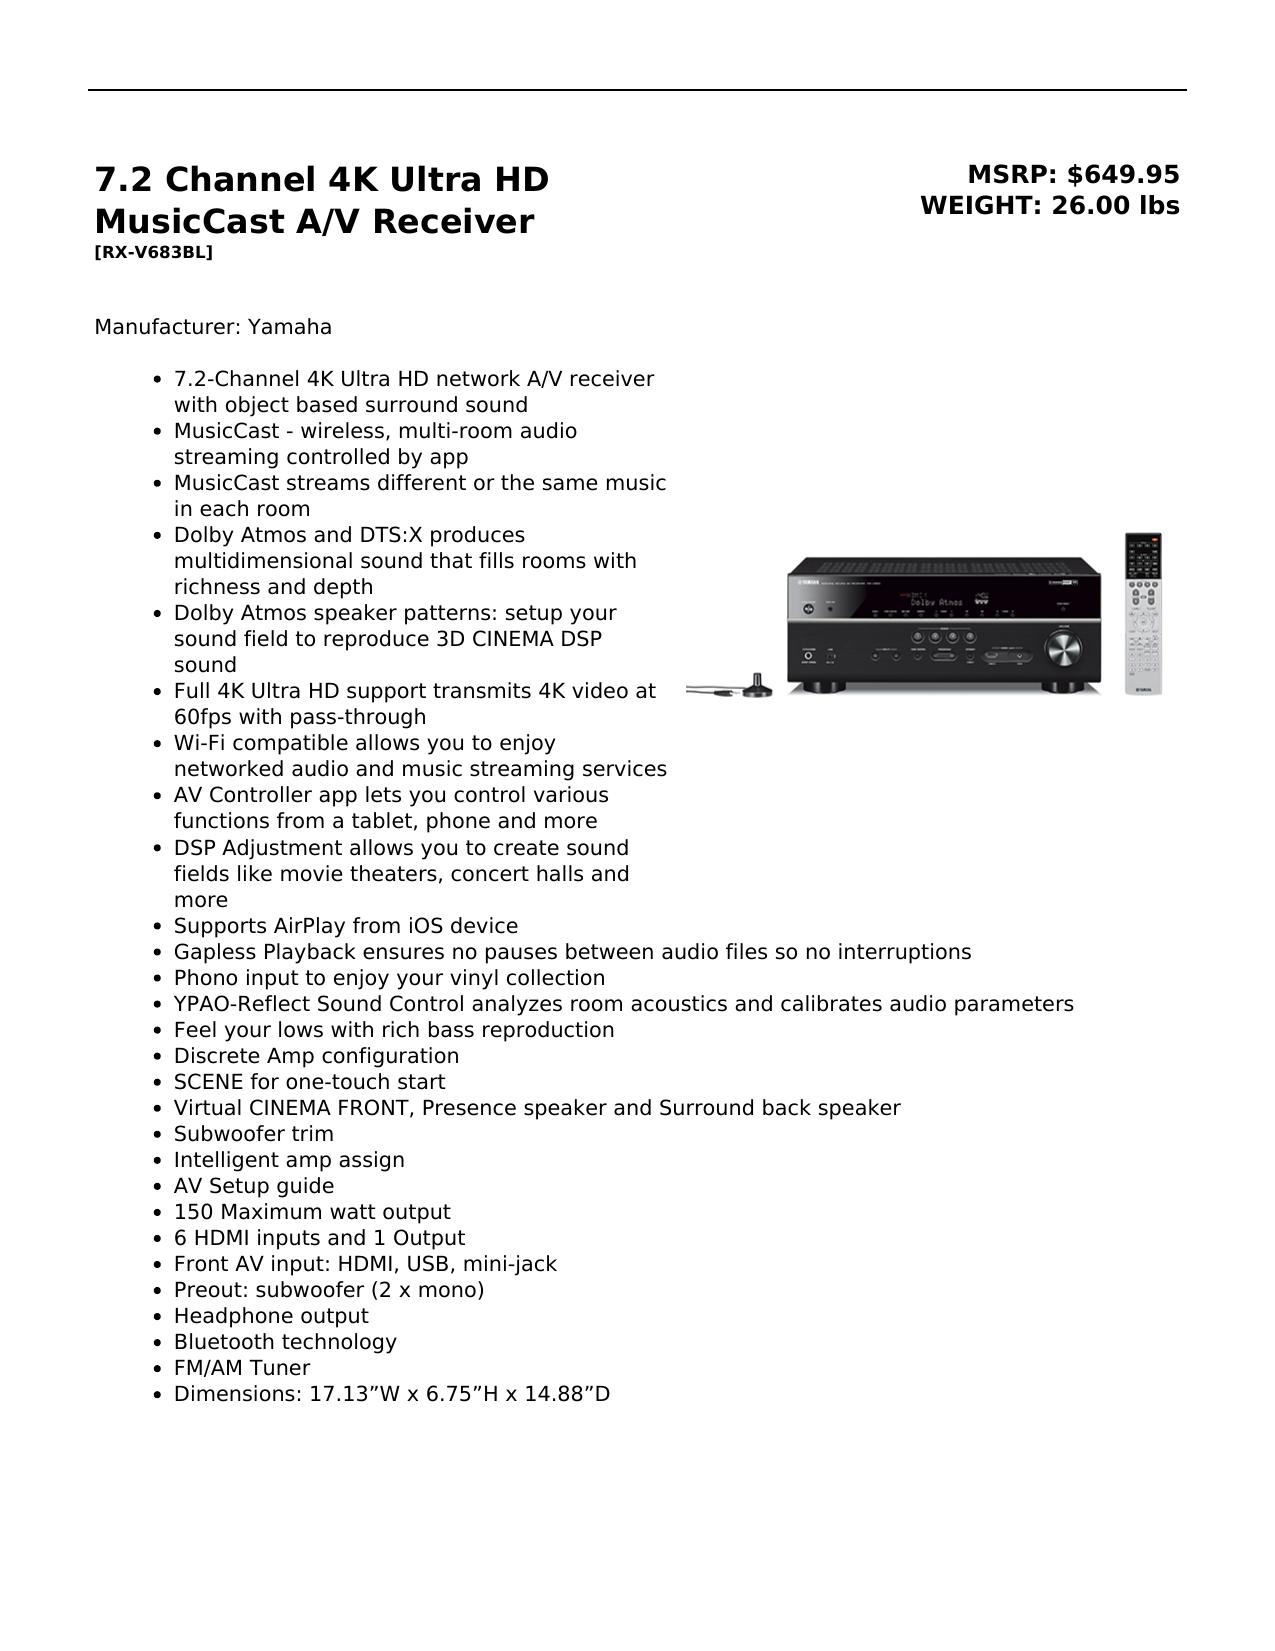 7 2 Channel 4K Ultra HD MusicCast A/V Receiver | manualzz com